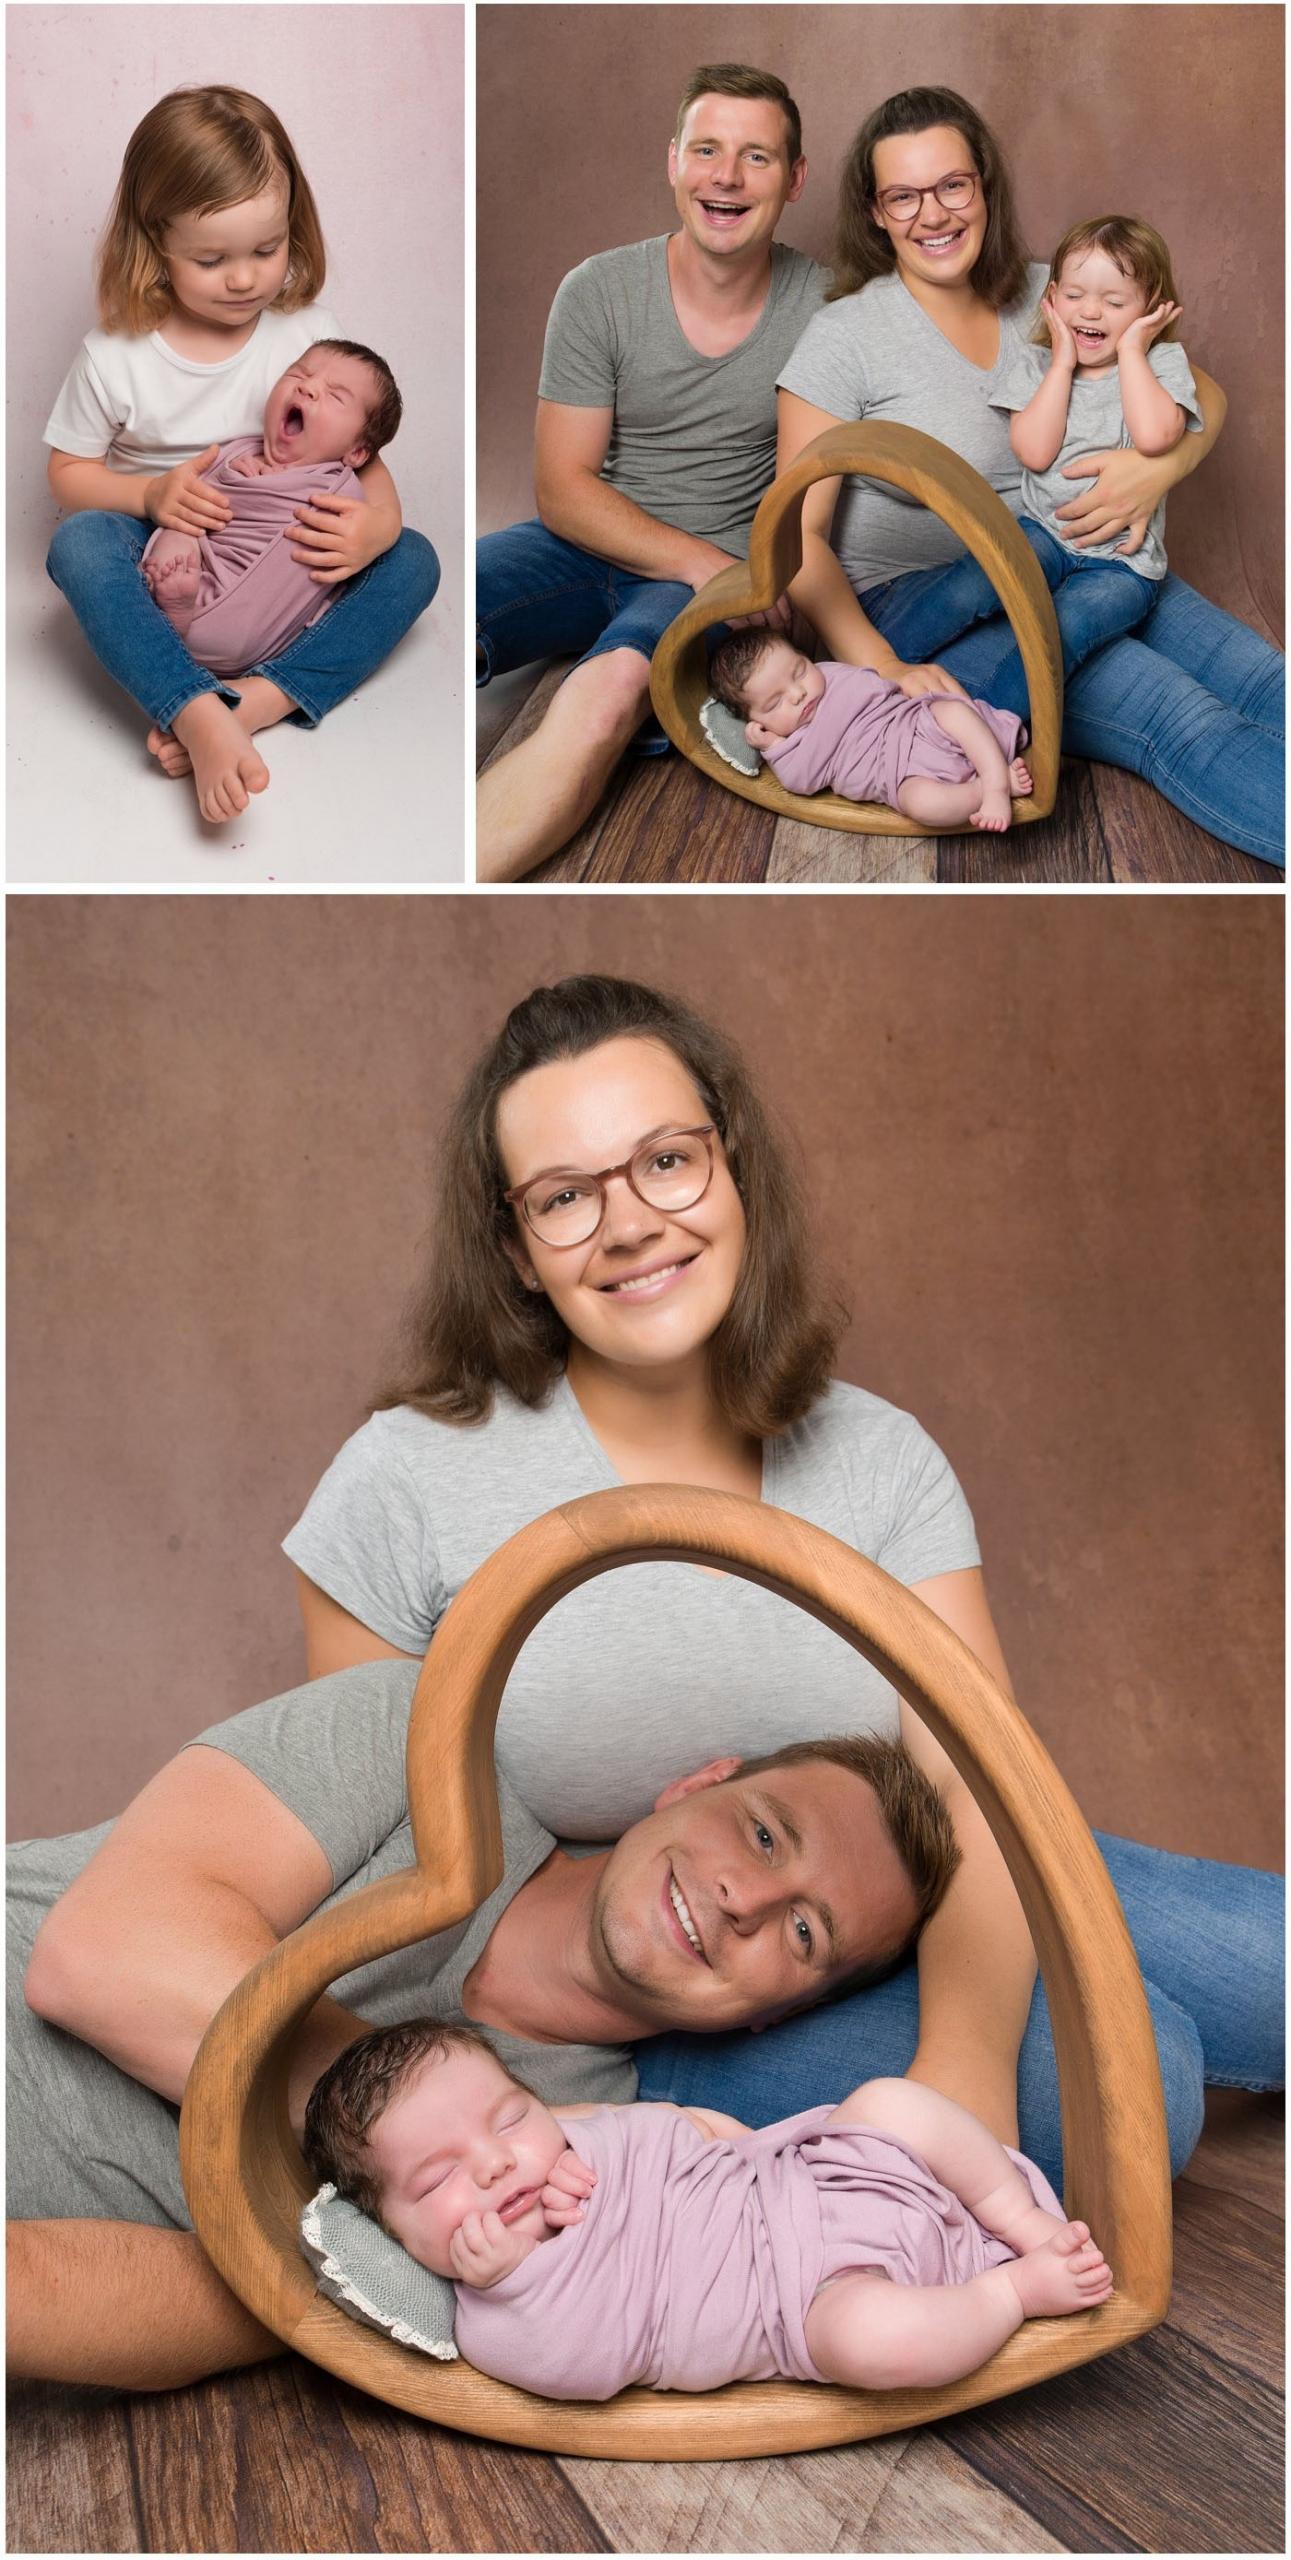 Baby Fotos im Vogtland (20-07-31)